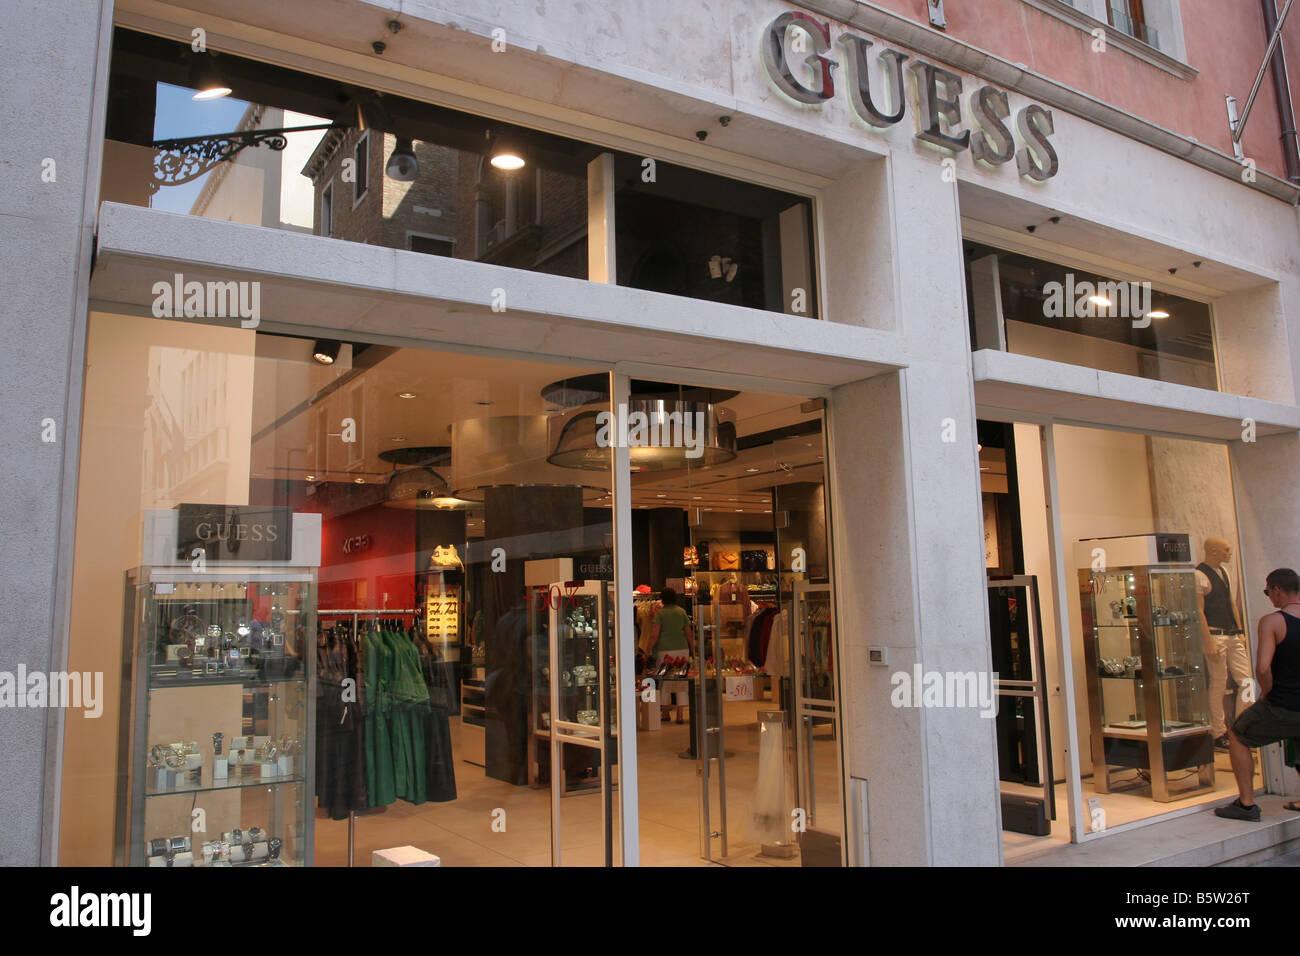 Guess Shop Stock Photos & Guess Shop Stock Images - Alamy